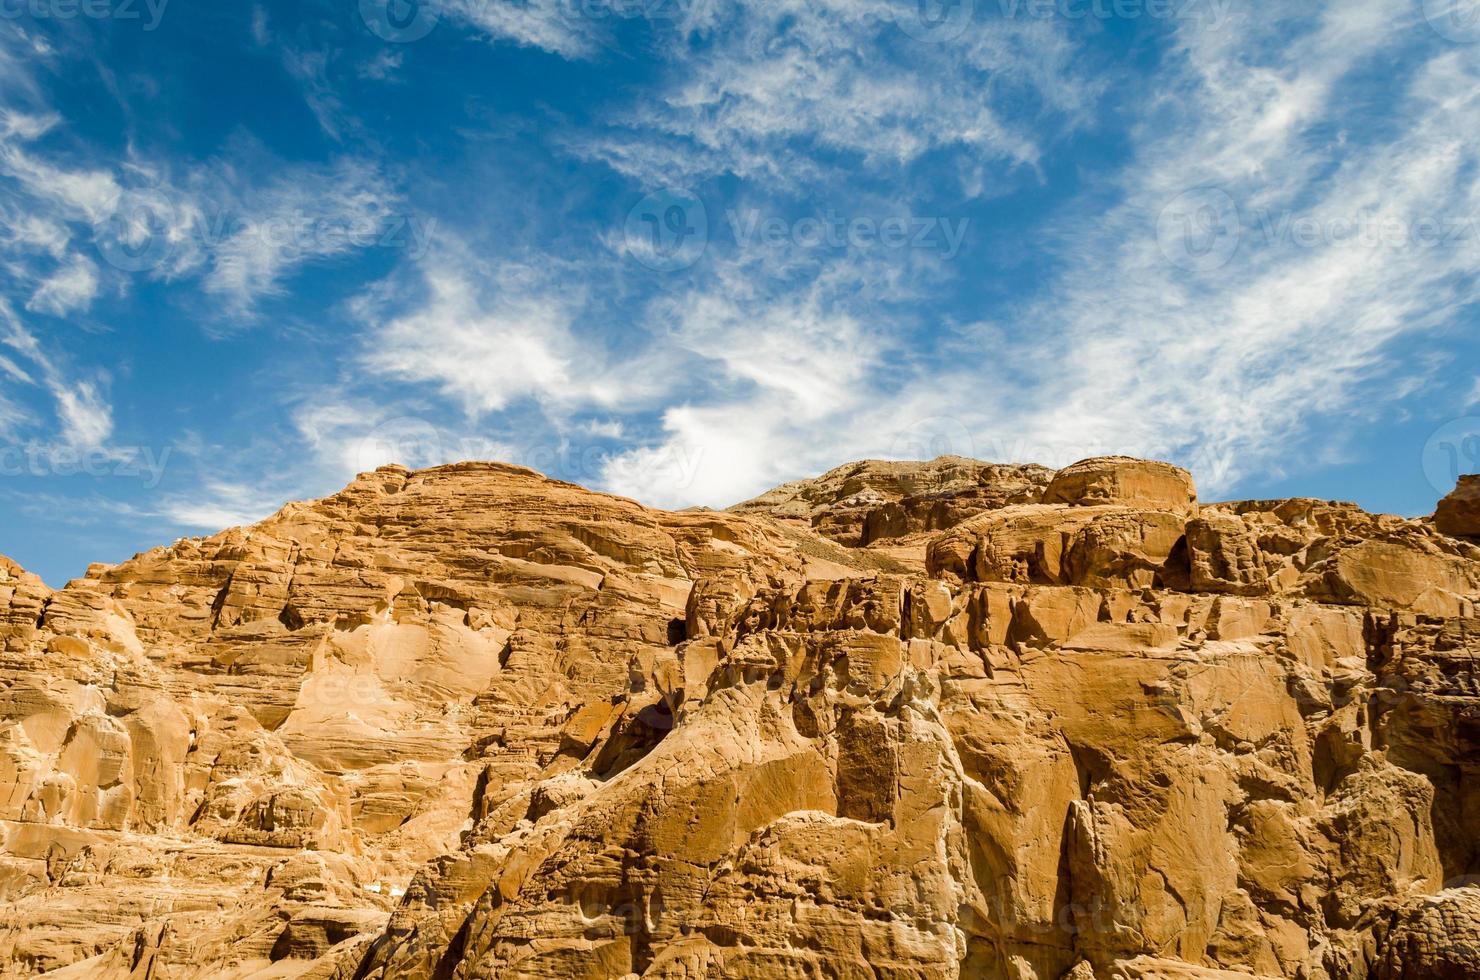 bruine rotsachtige bergen en blauwe hemel met wolken foto